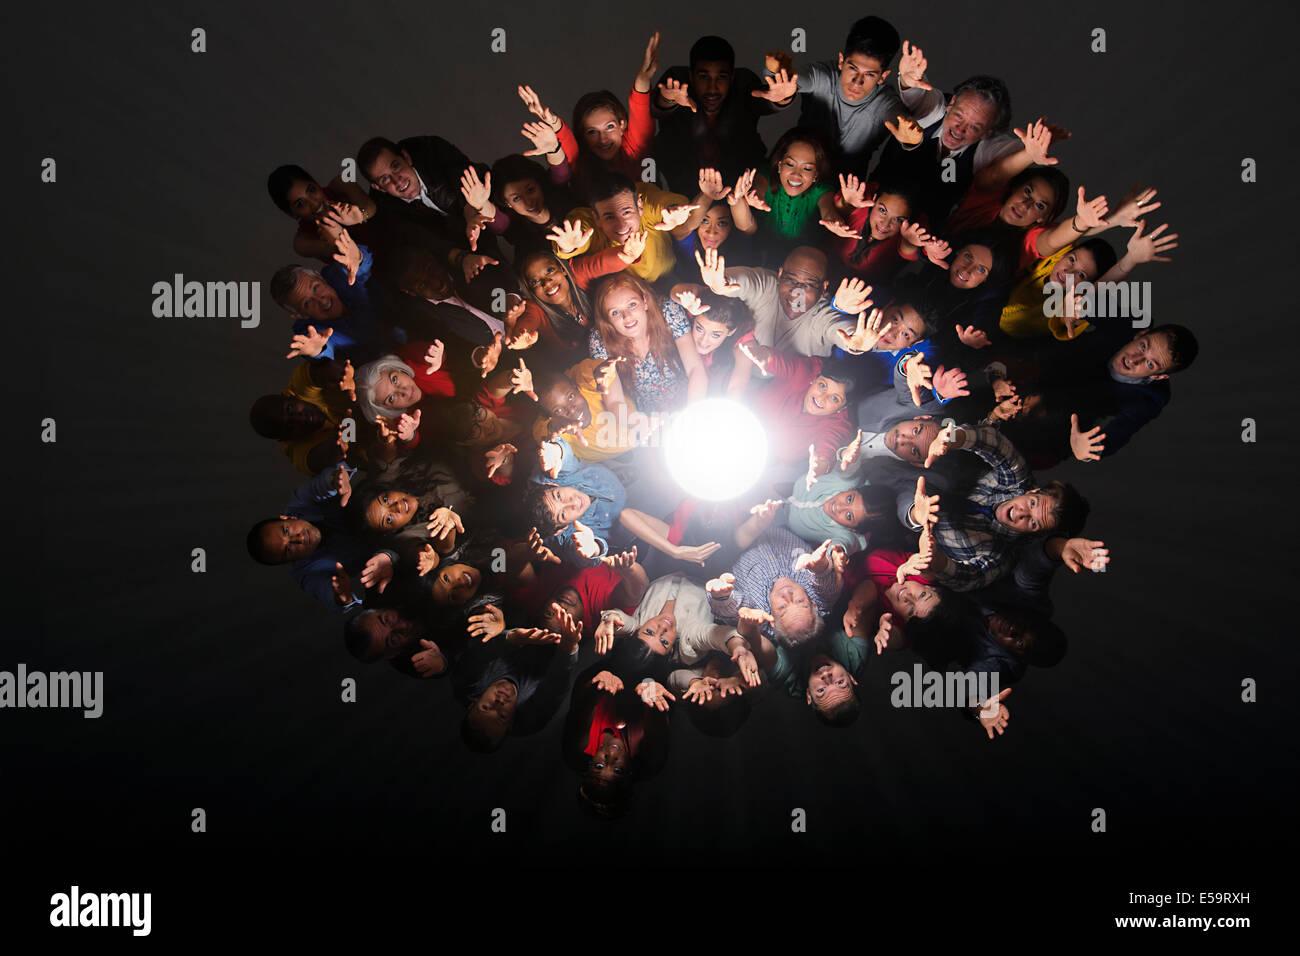 Diverse crowd cheering around bright light - Stock Image